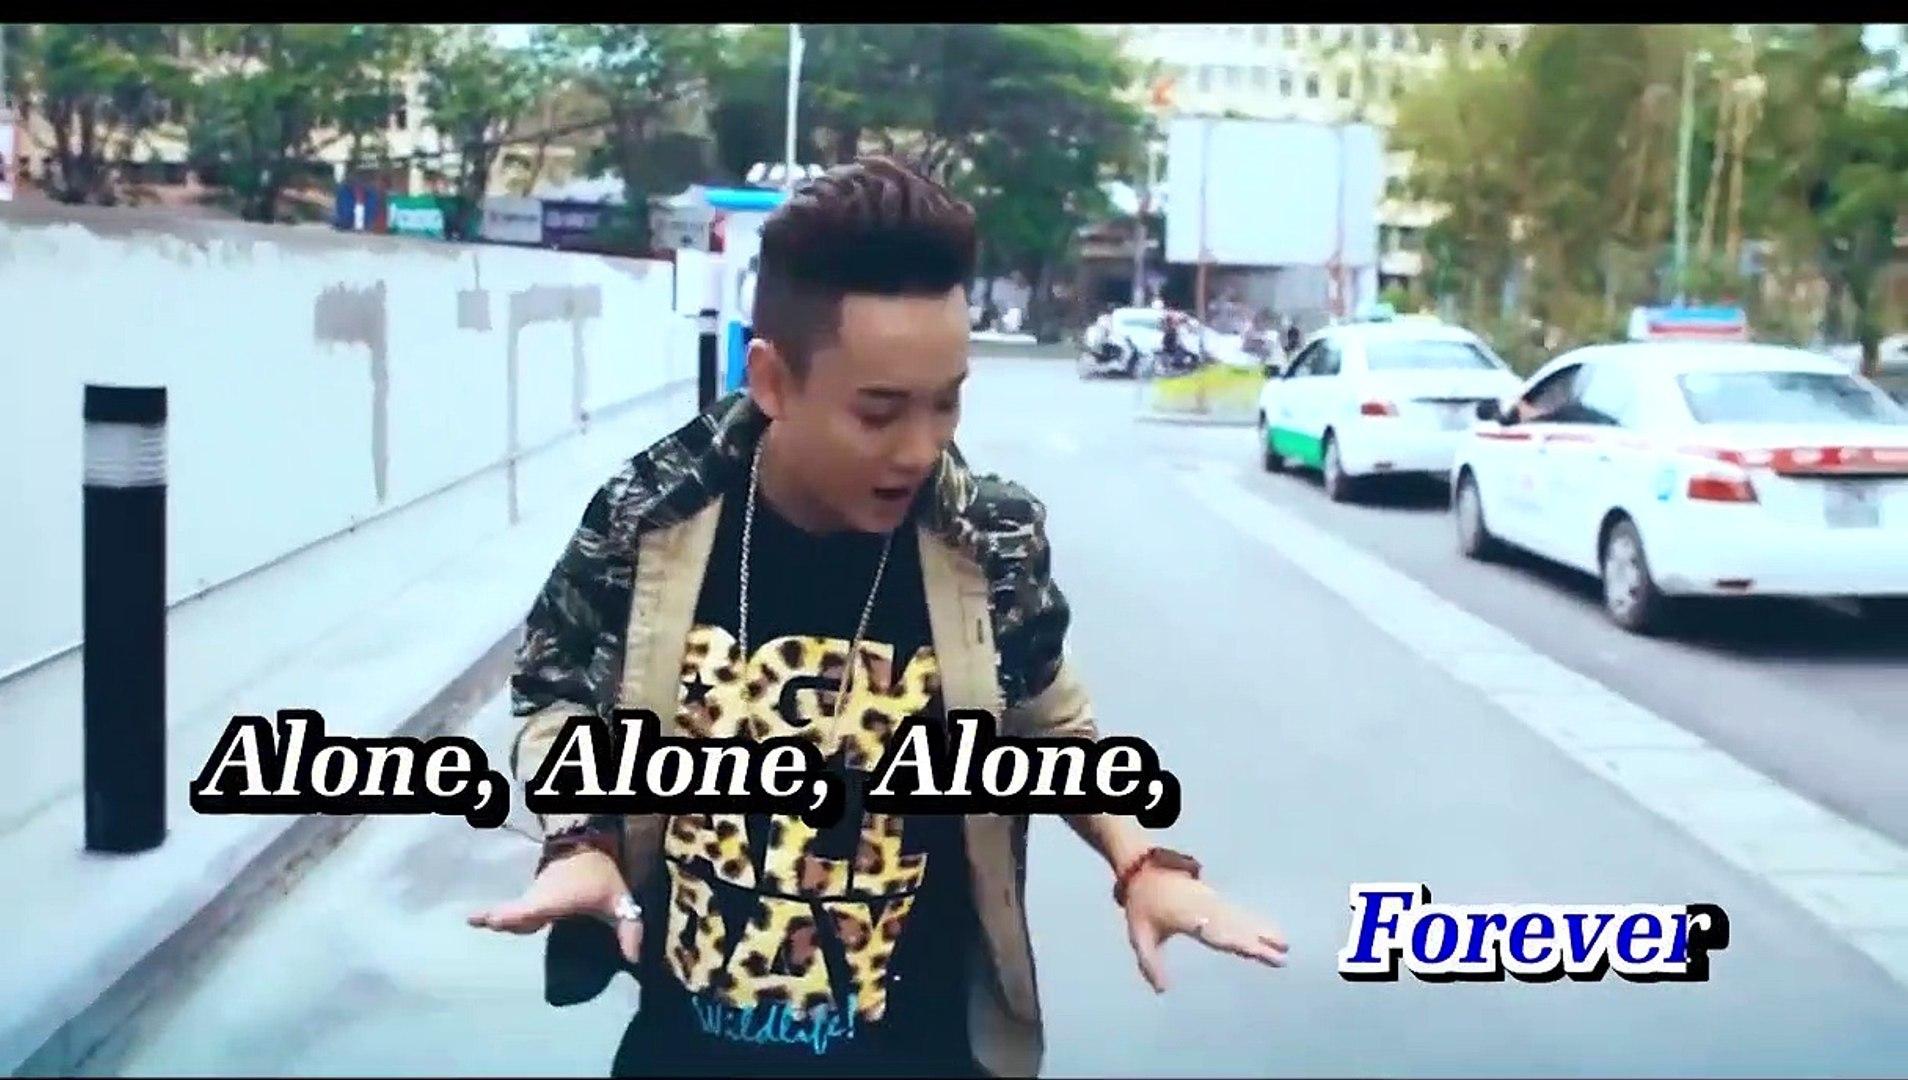 [Karaoke] Forever Alone - Justatee [Beat]